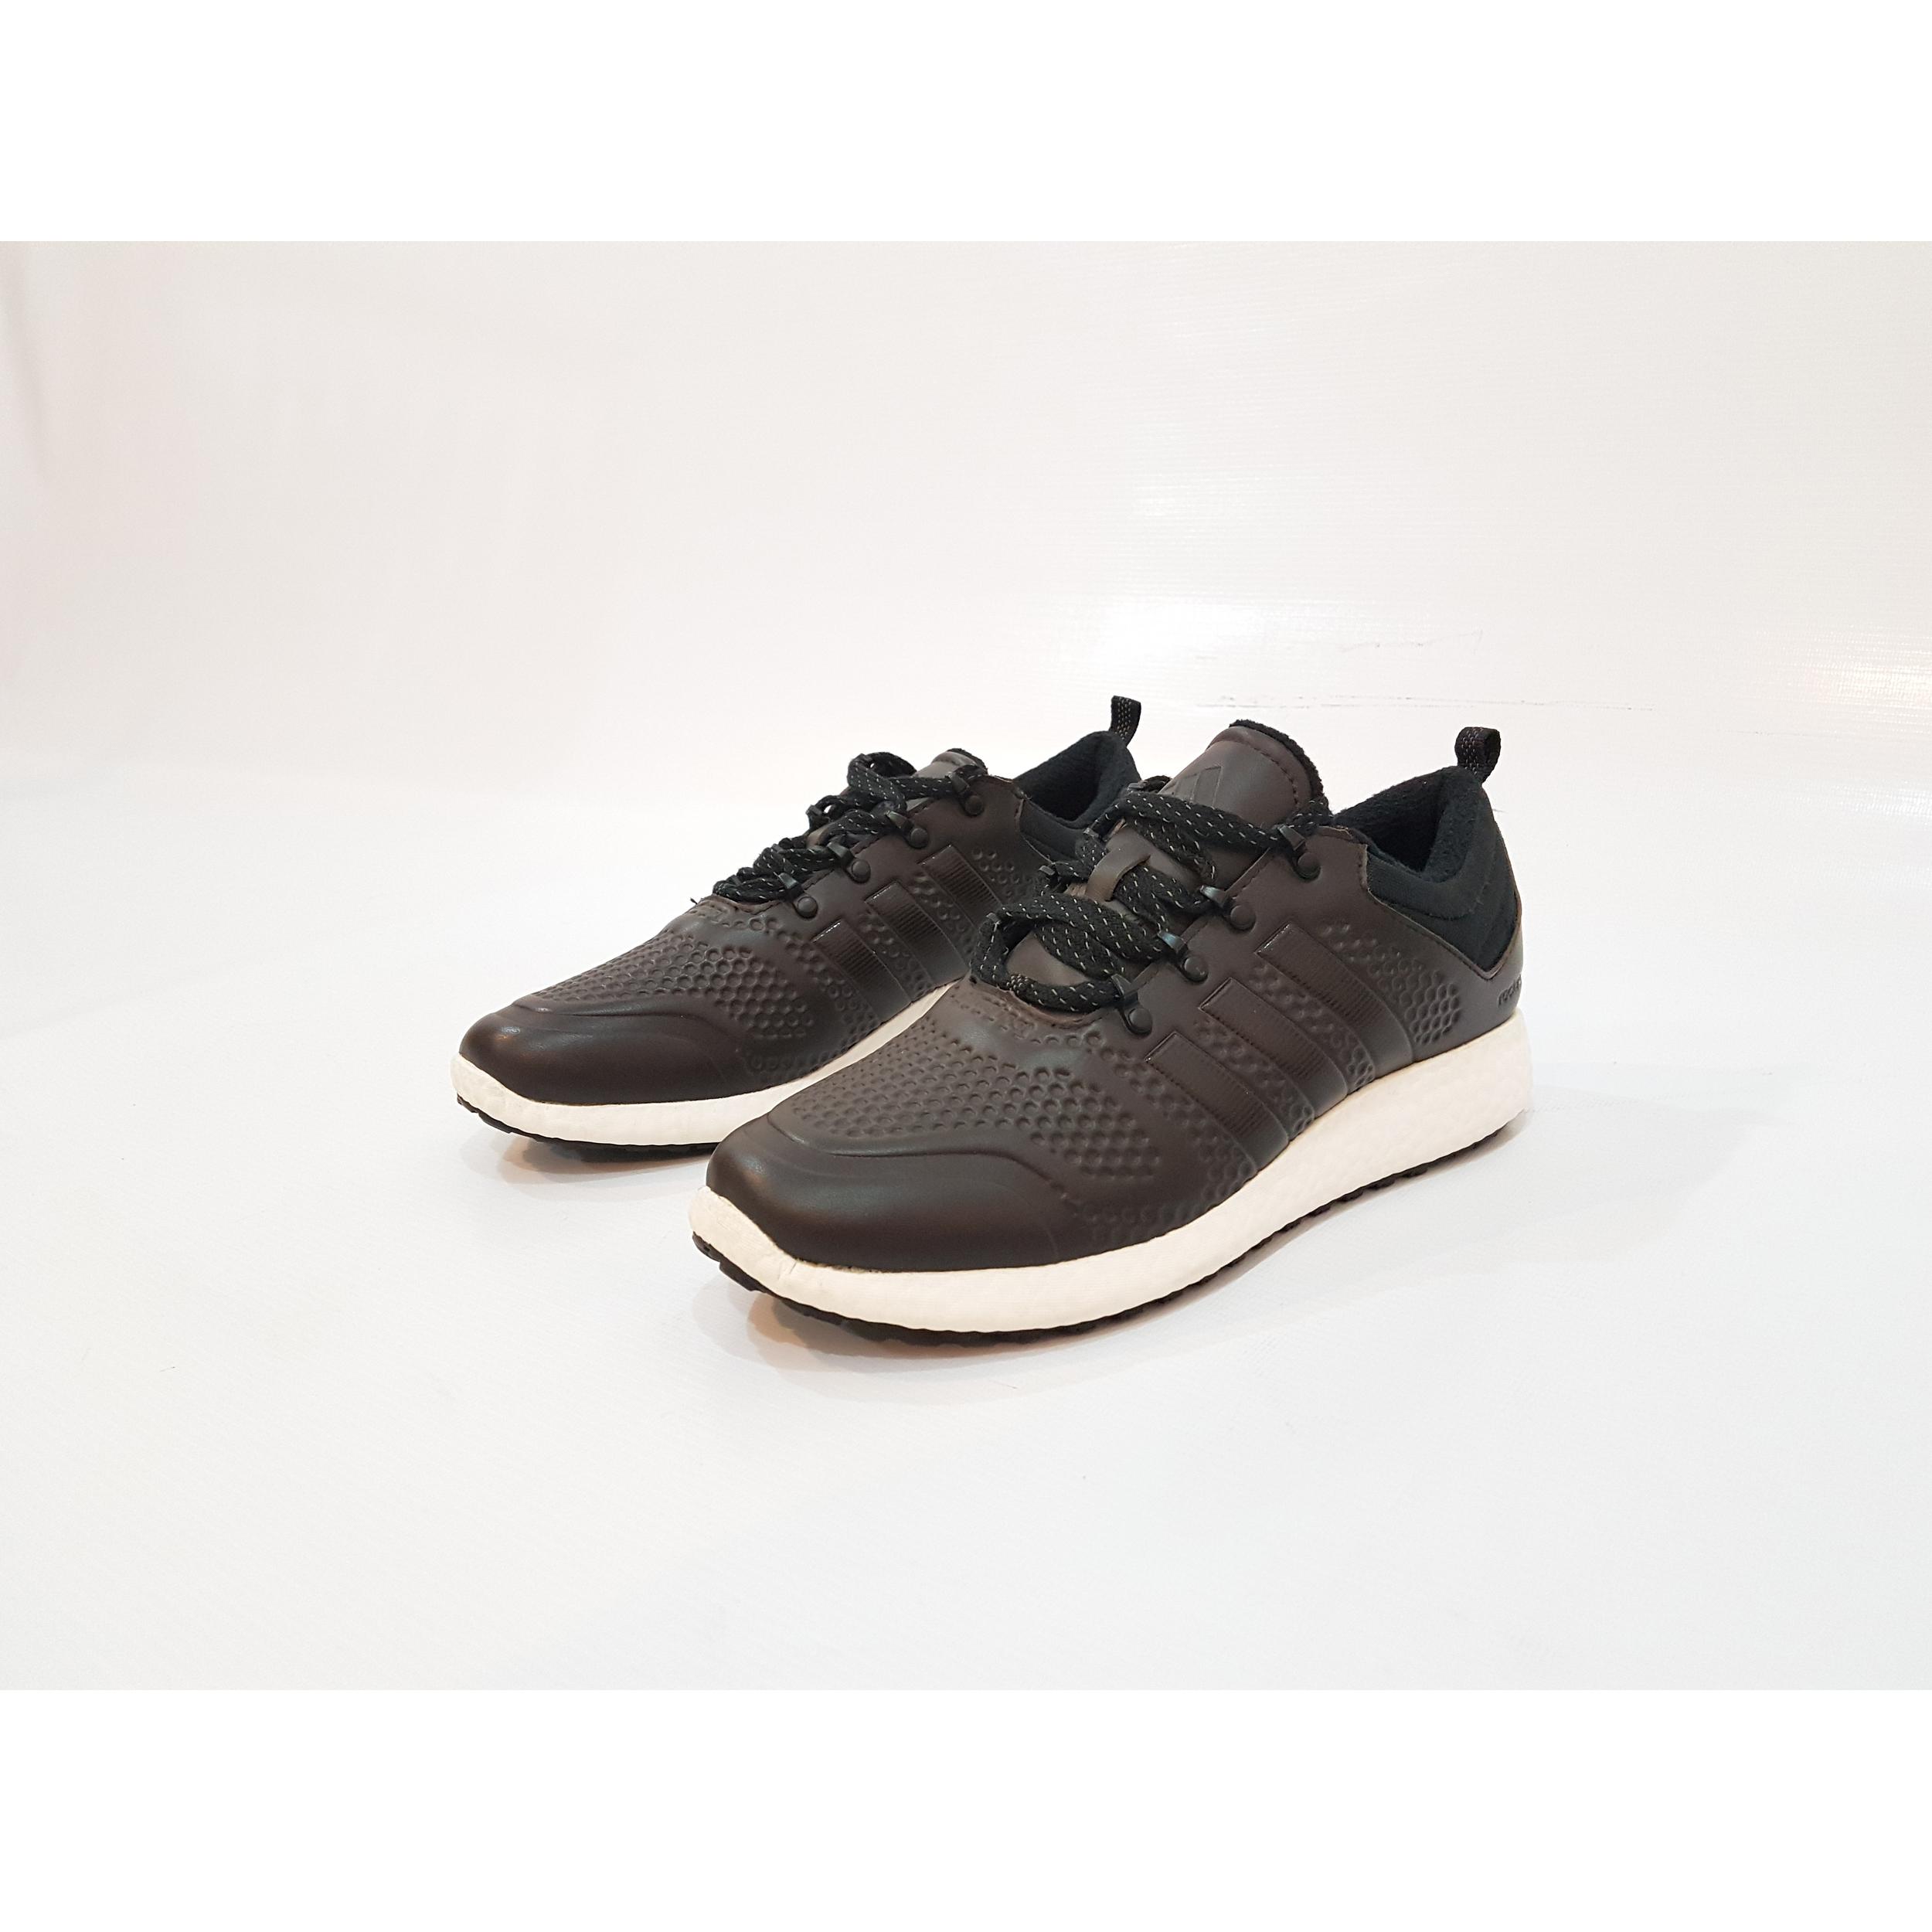 خرید                      کفش پیاده روی مردانه آدیداس مدل rocket boost